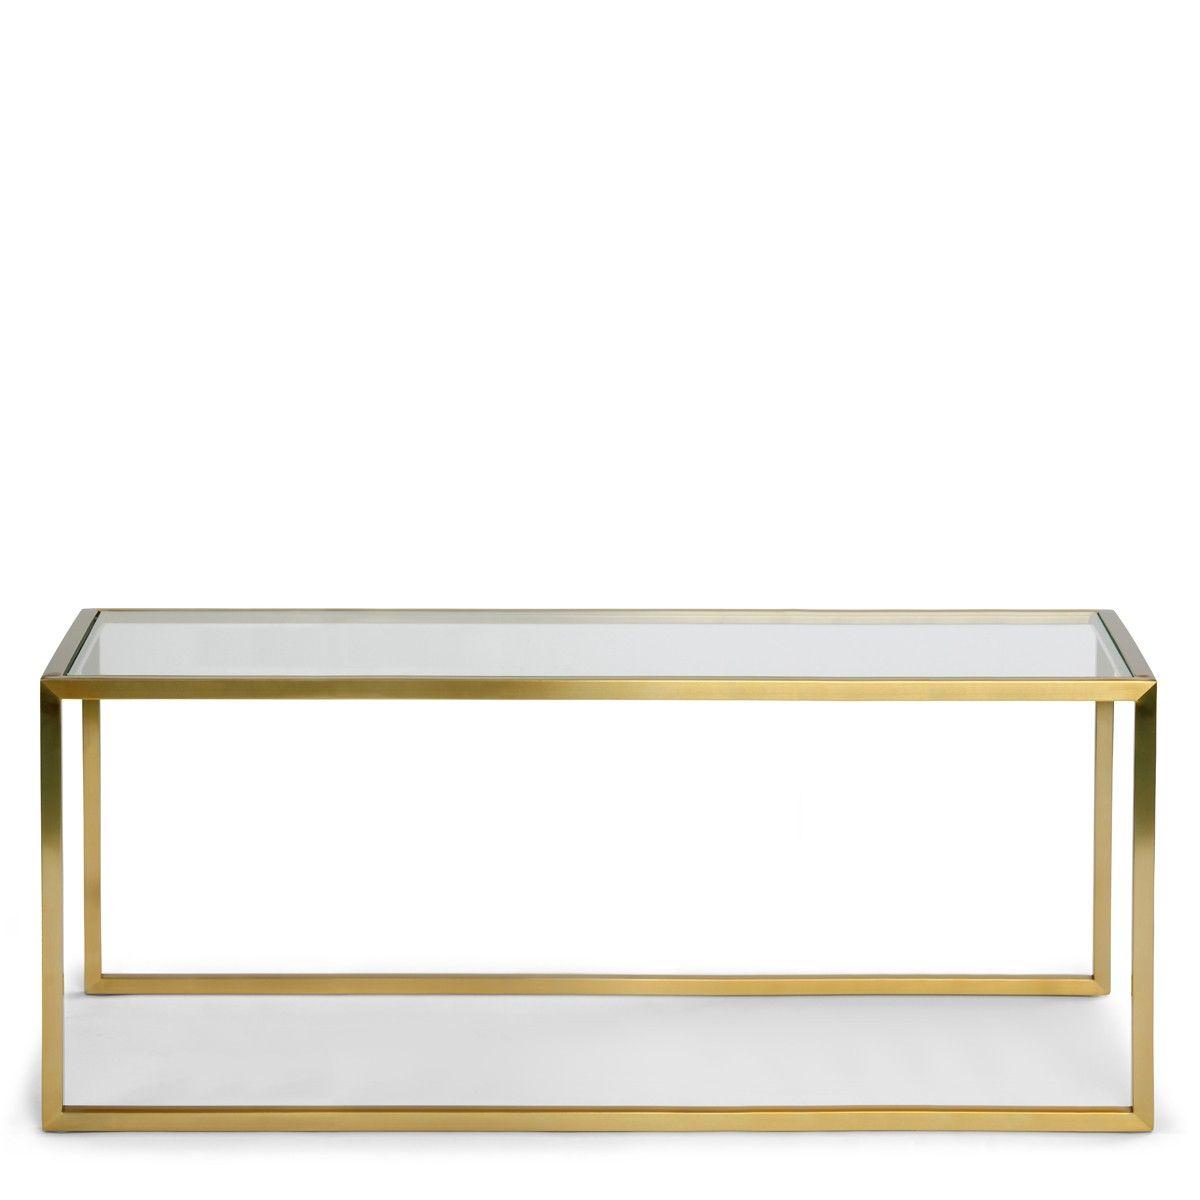 Hemingway coffee table withinhome furniture u accessories